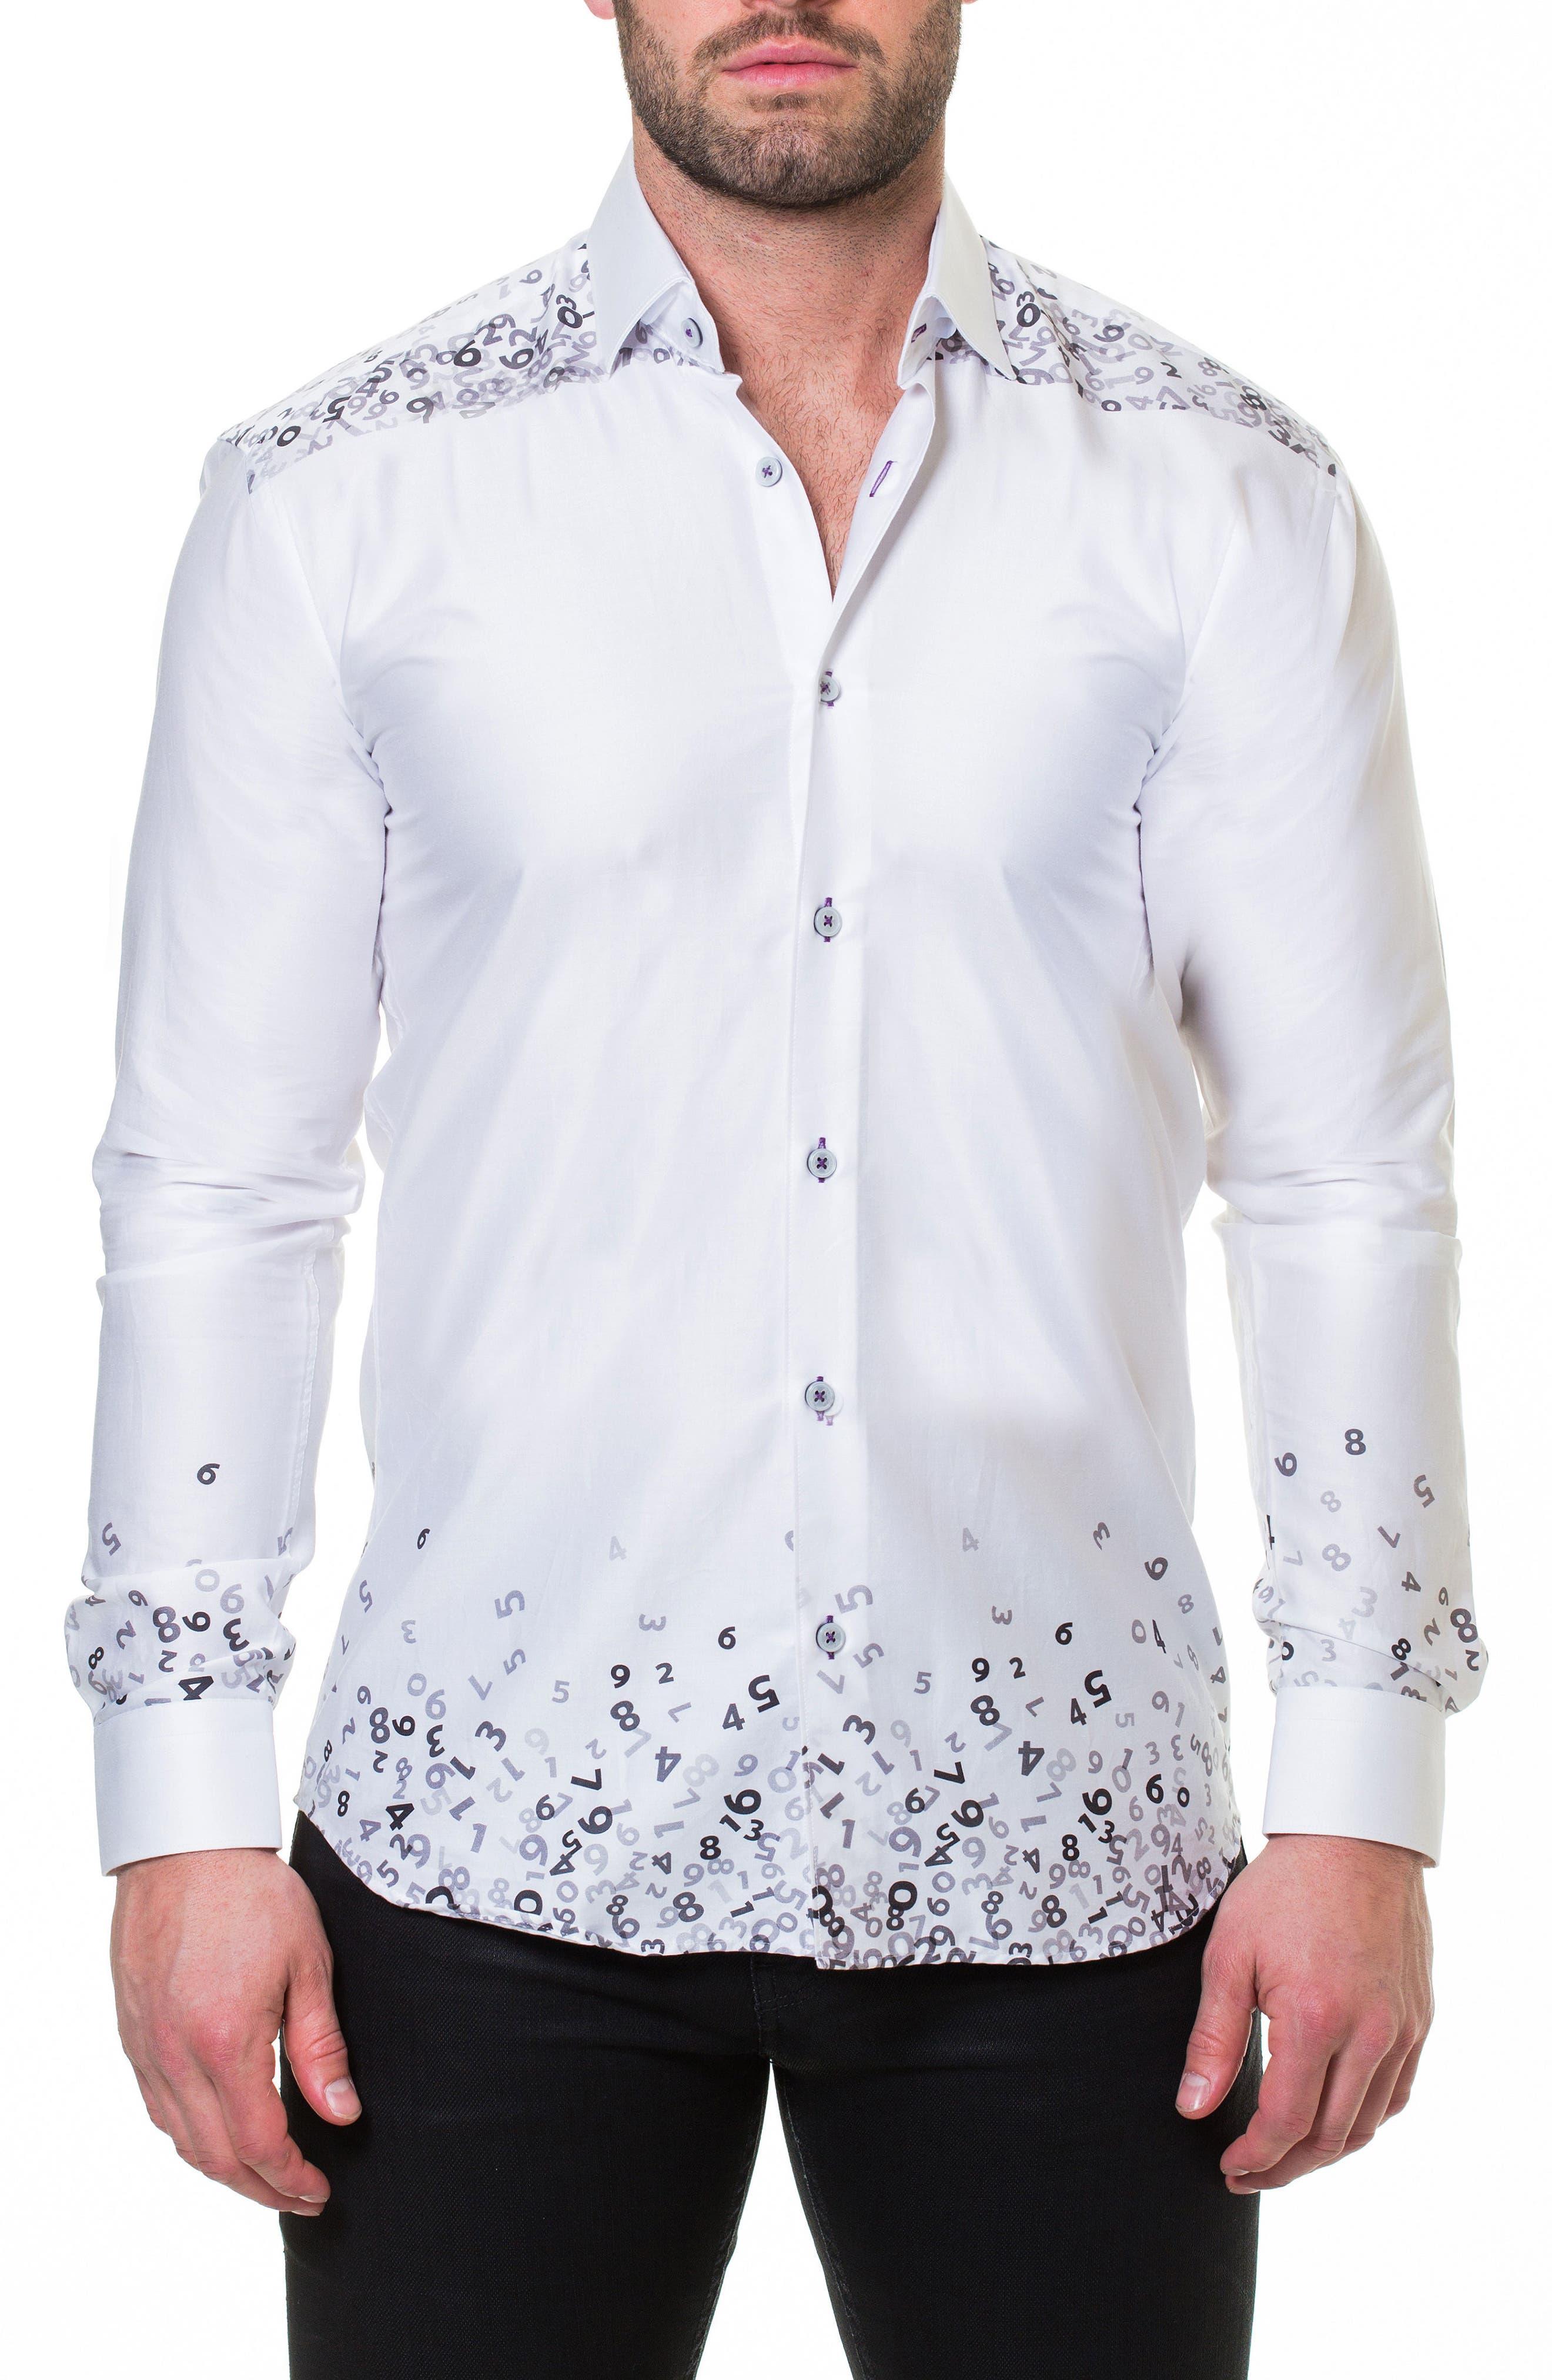 Luxor Counting White Slim Fit Sport Shirt,                             Alternate thumbnail 3, color,                             White